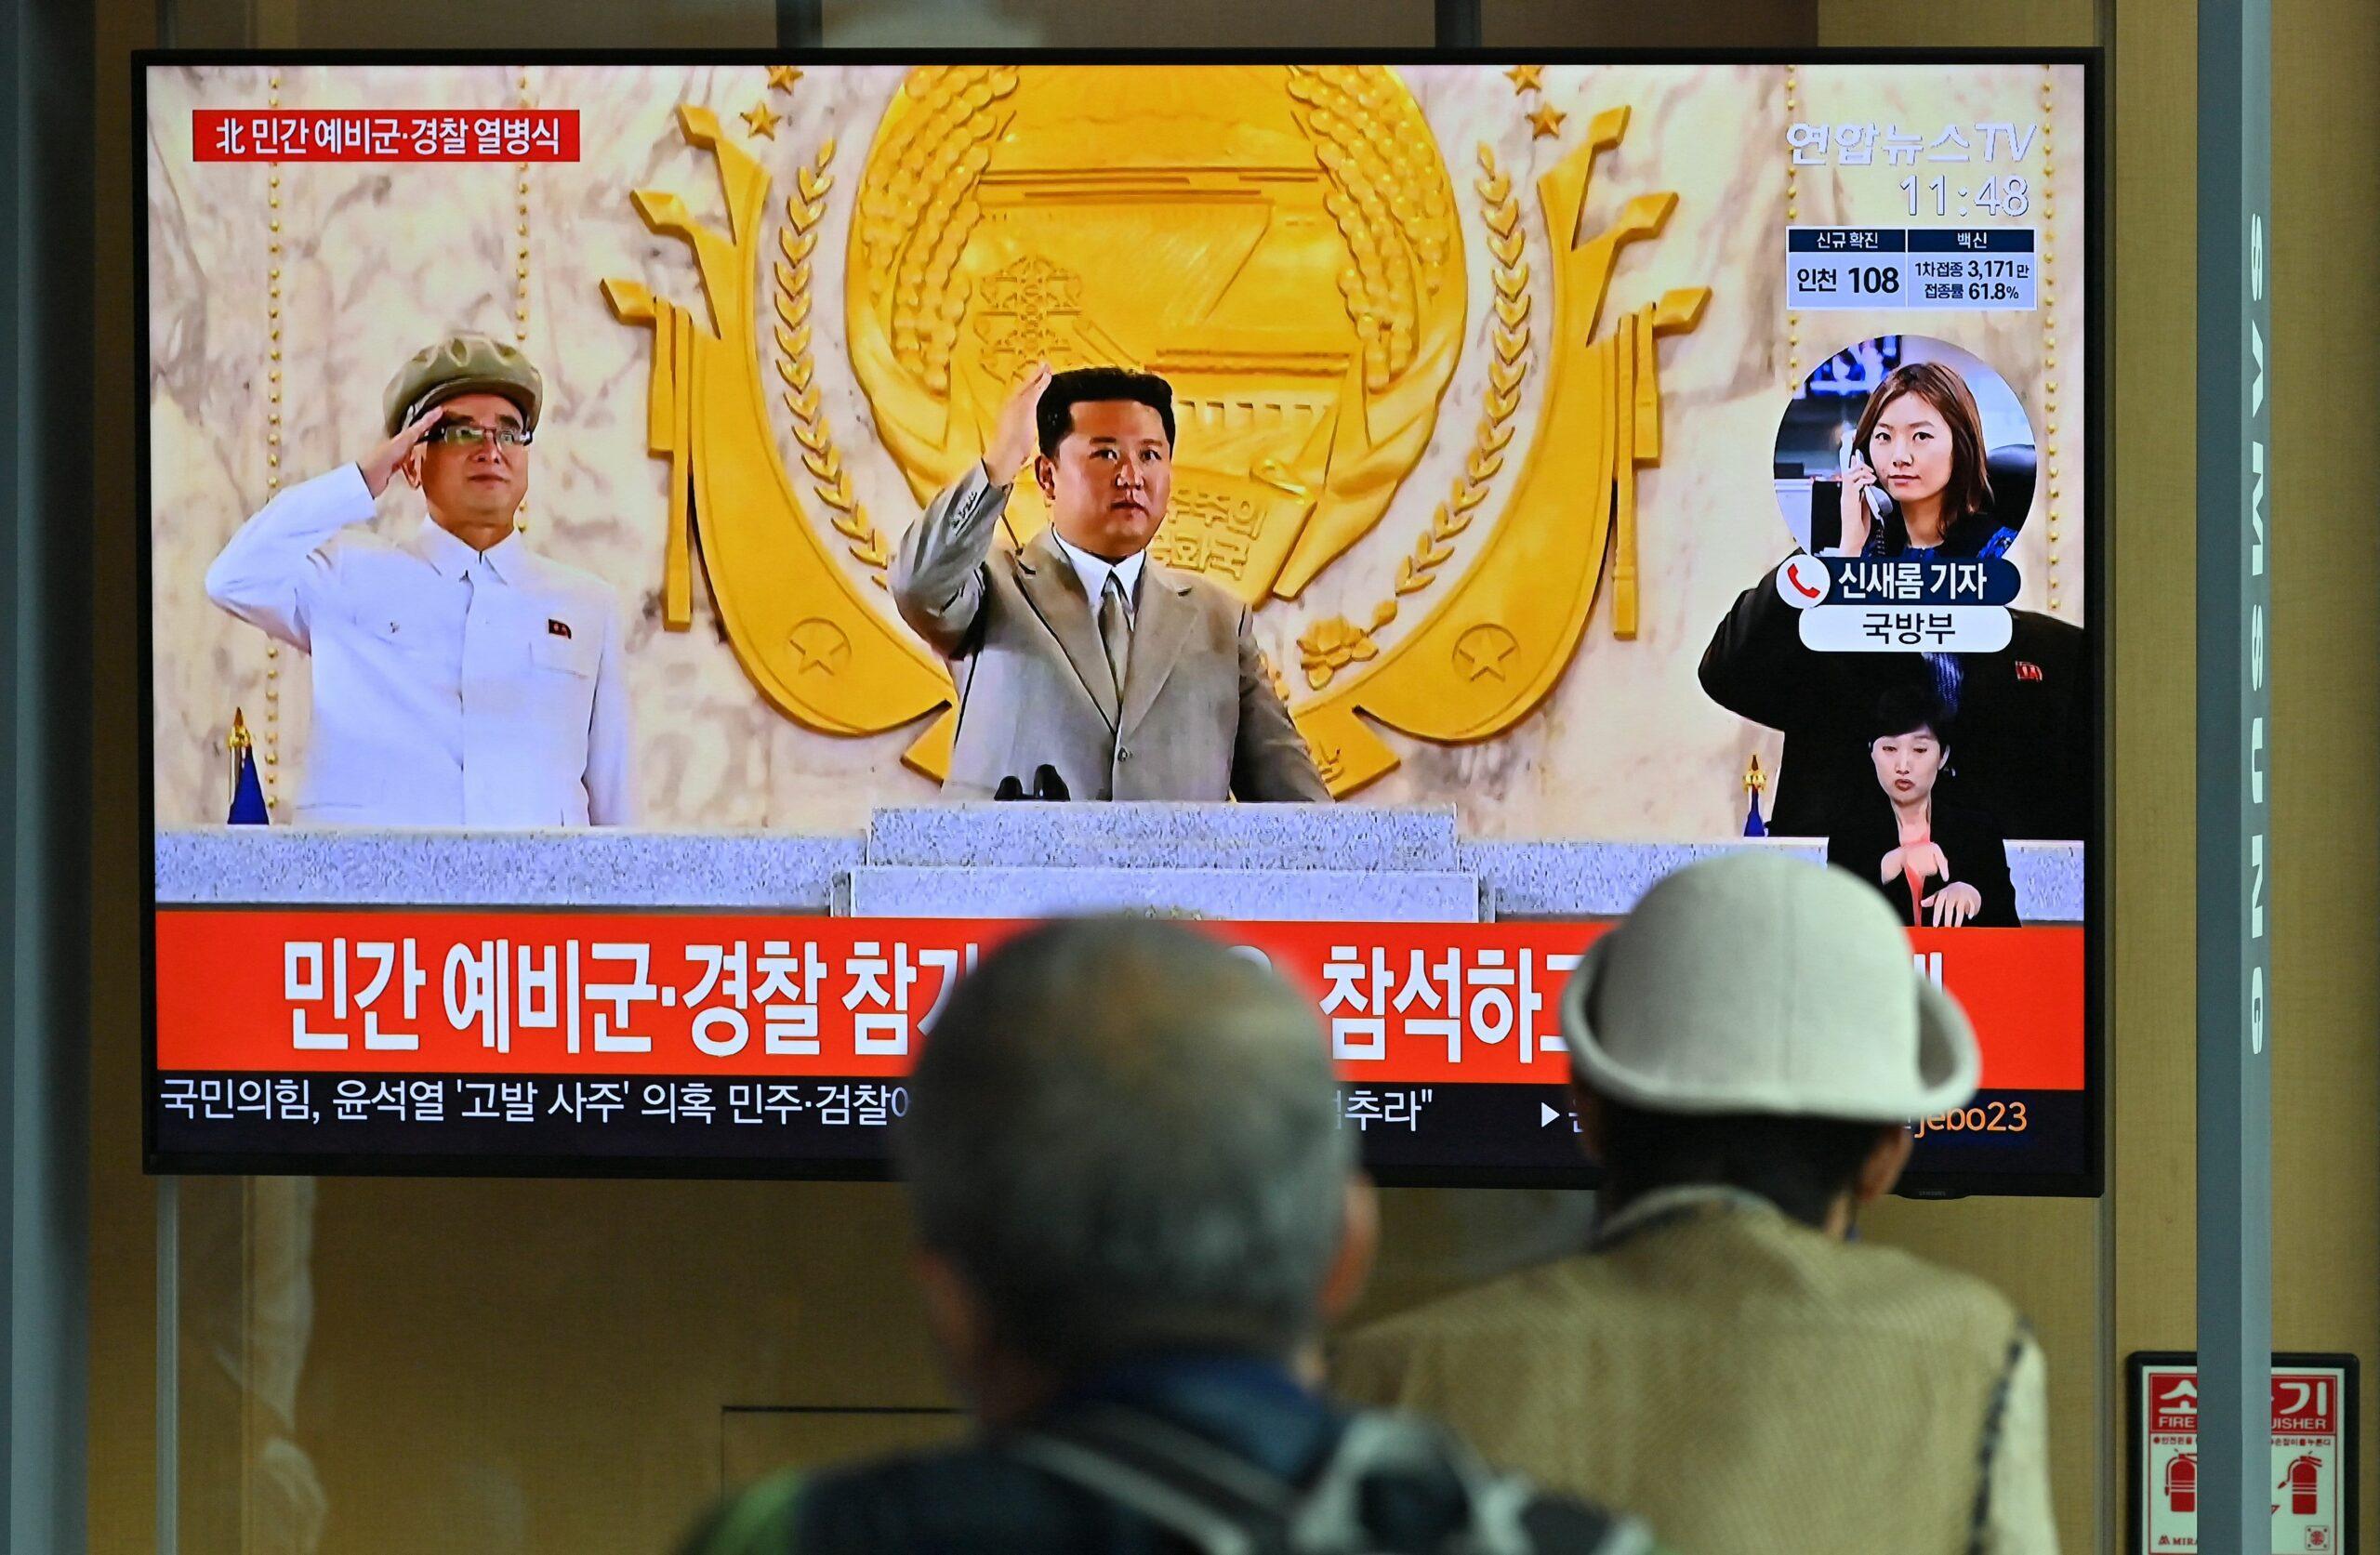 Japan condemns North Korea's ballistic missile launch